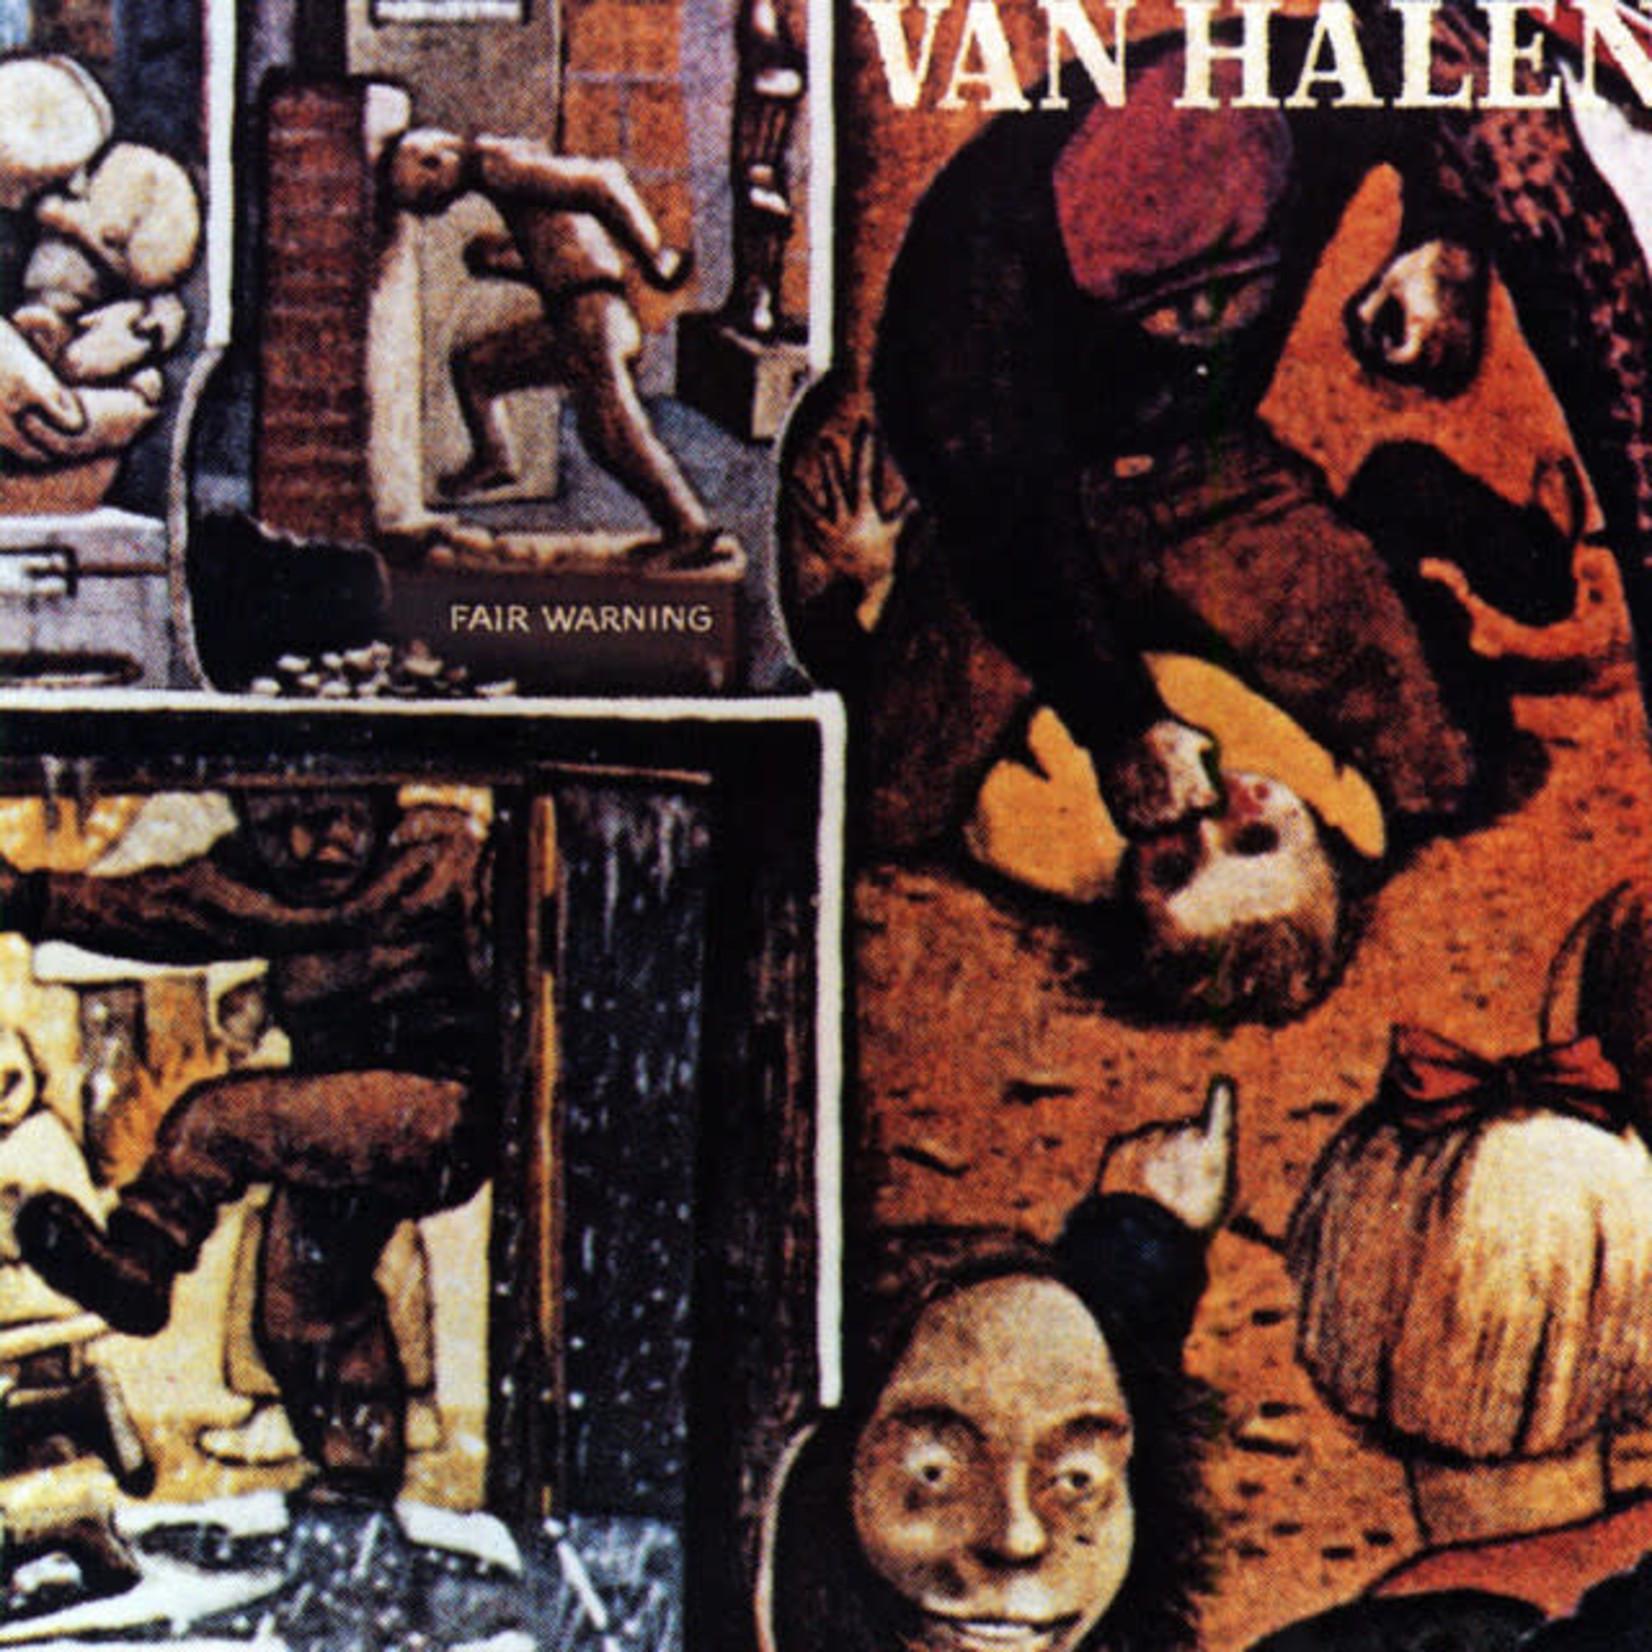 Vinyl Van Halen - Fair Warning